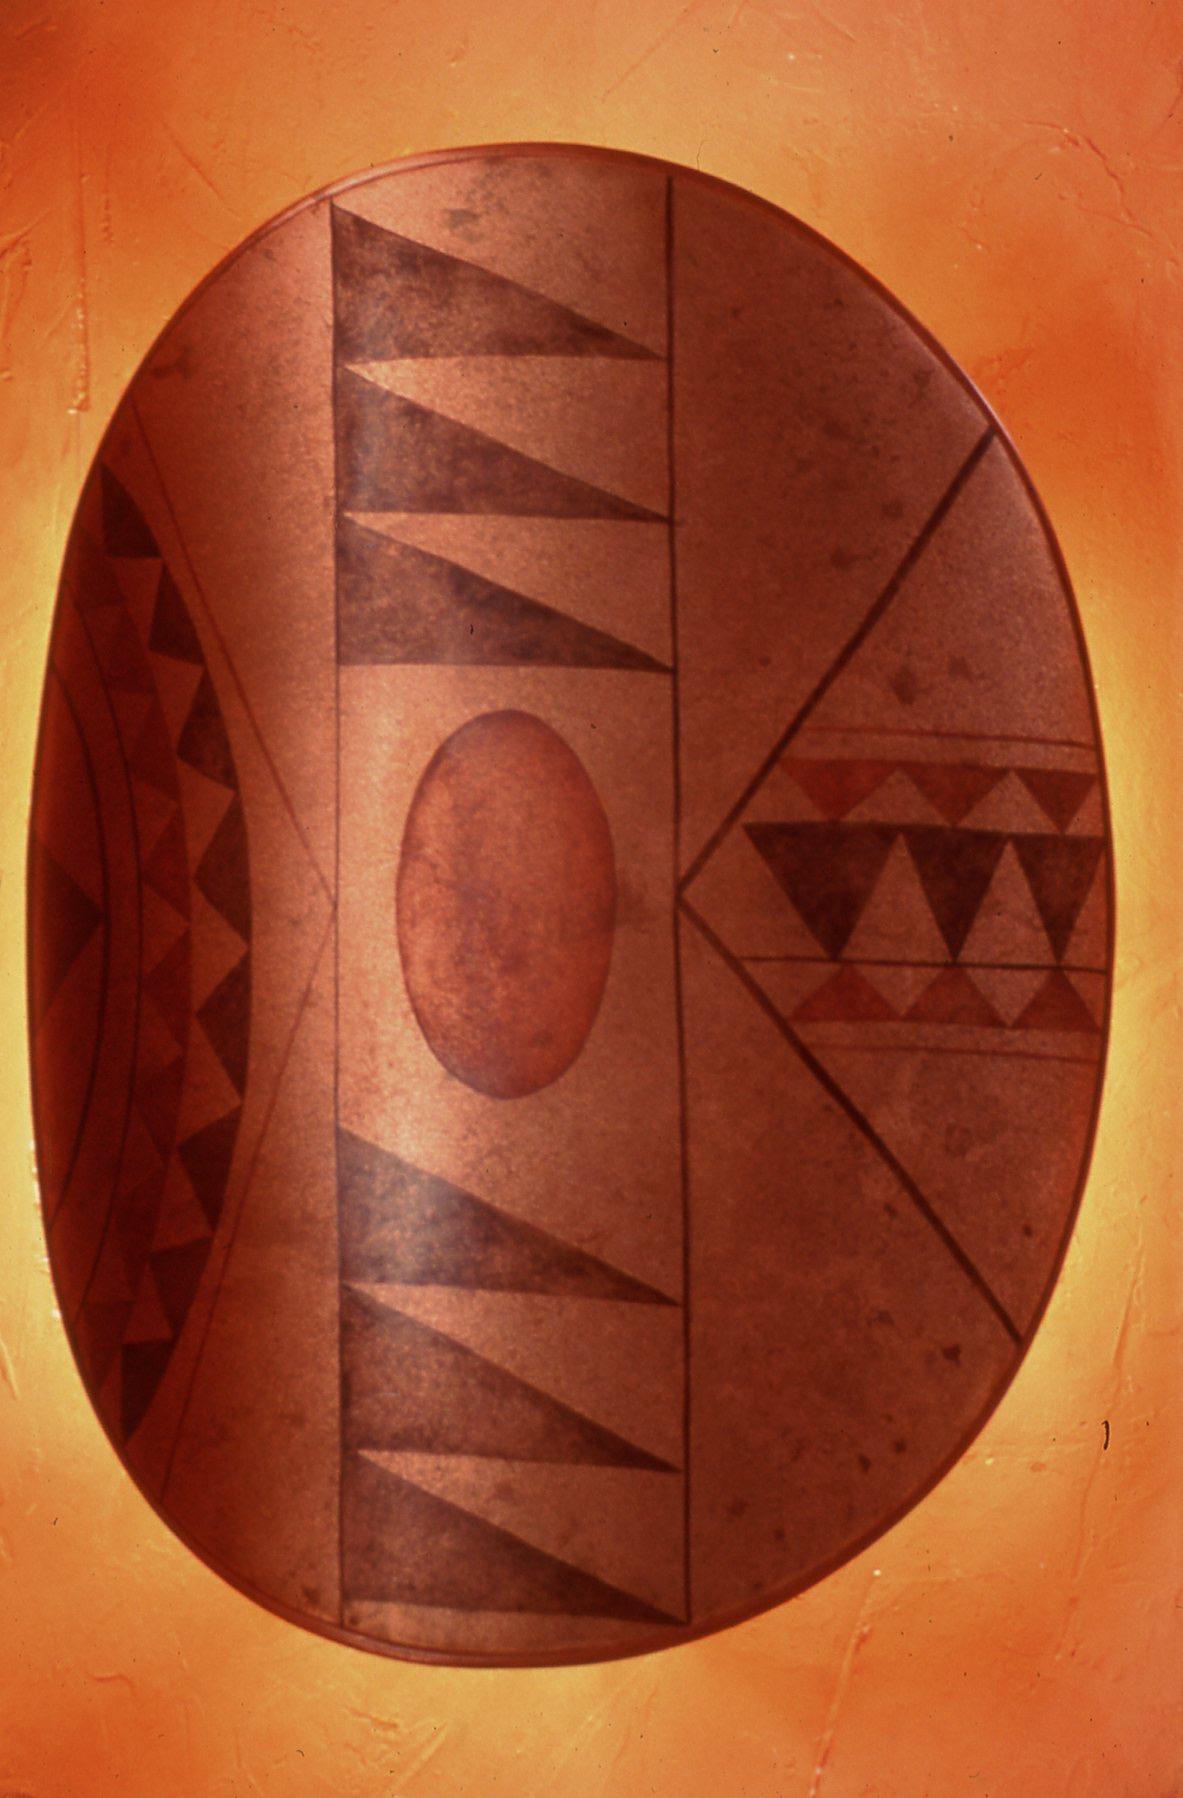 BayviewPoliceStation-Maasai Warrior Shield Light Sconce.jpg